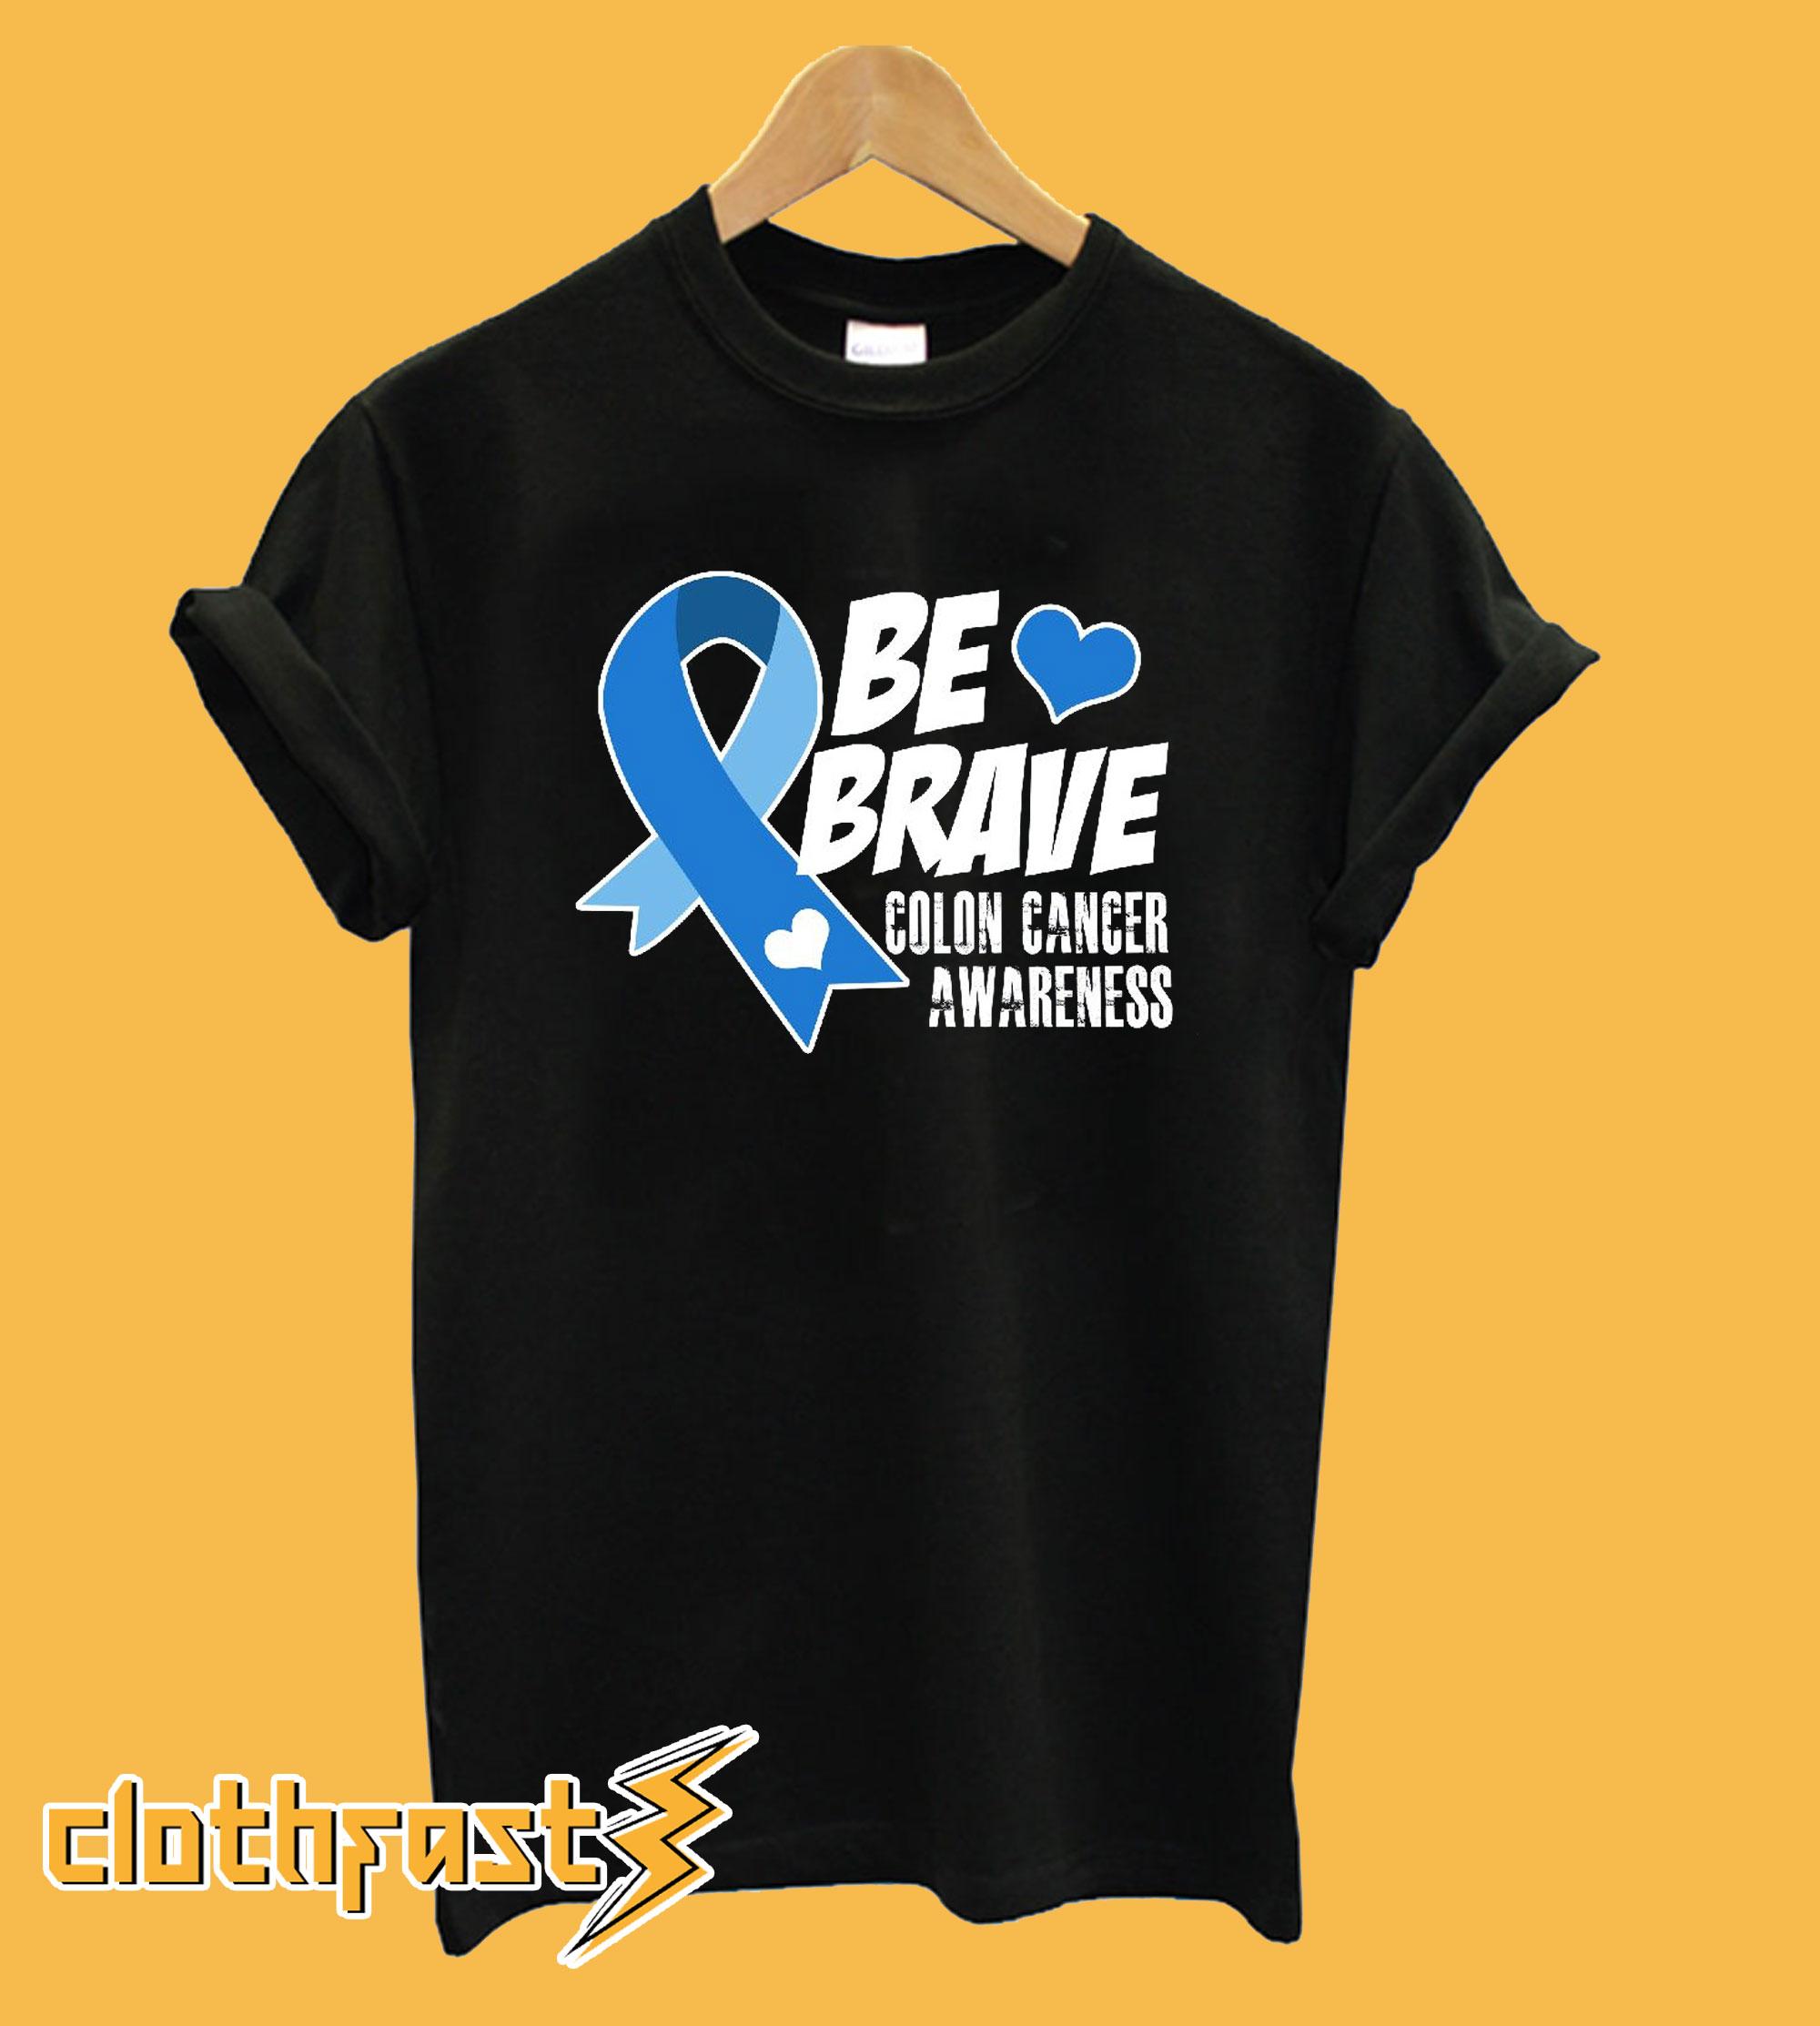 Colon Cancer Awareness T-Shirt